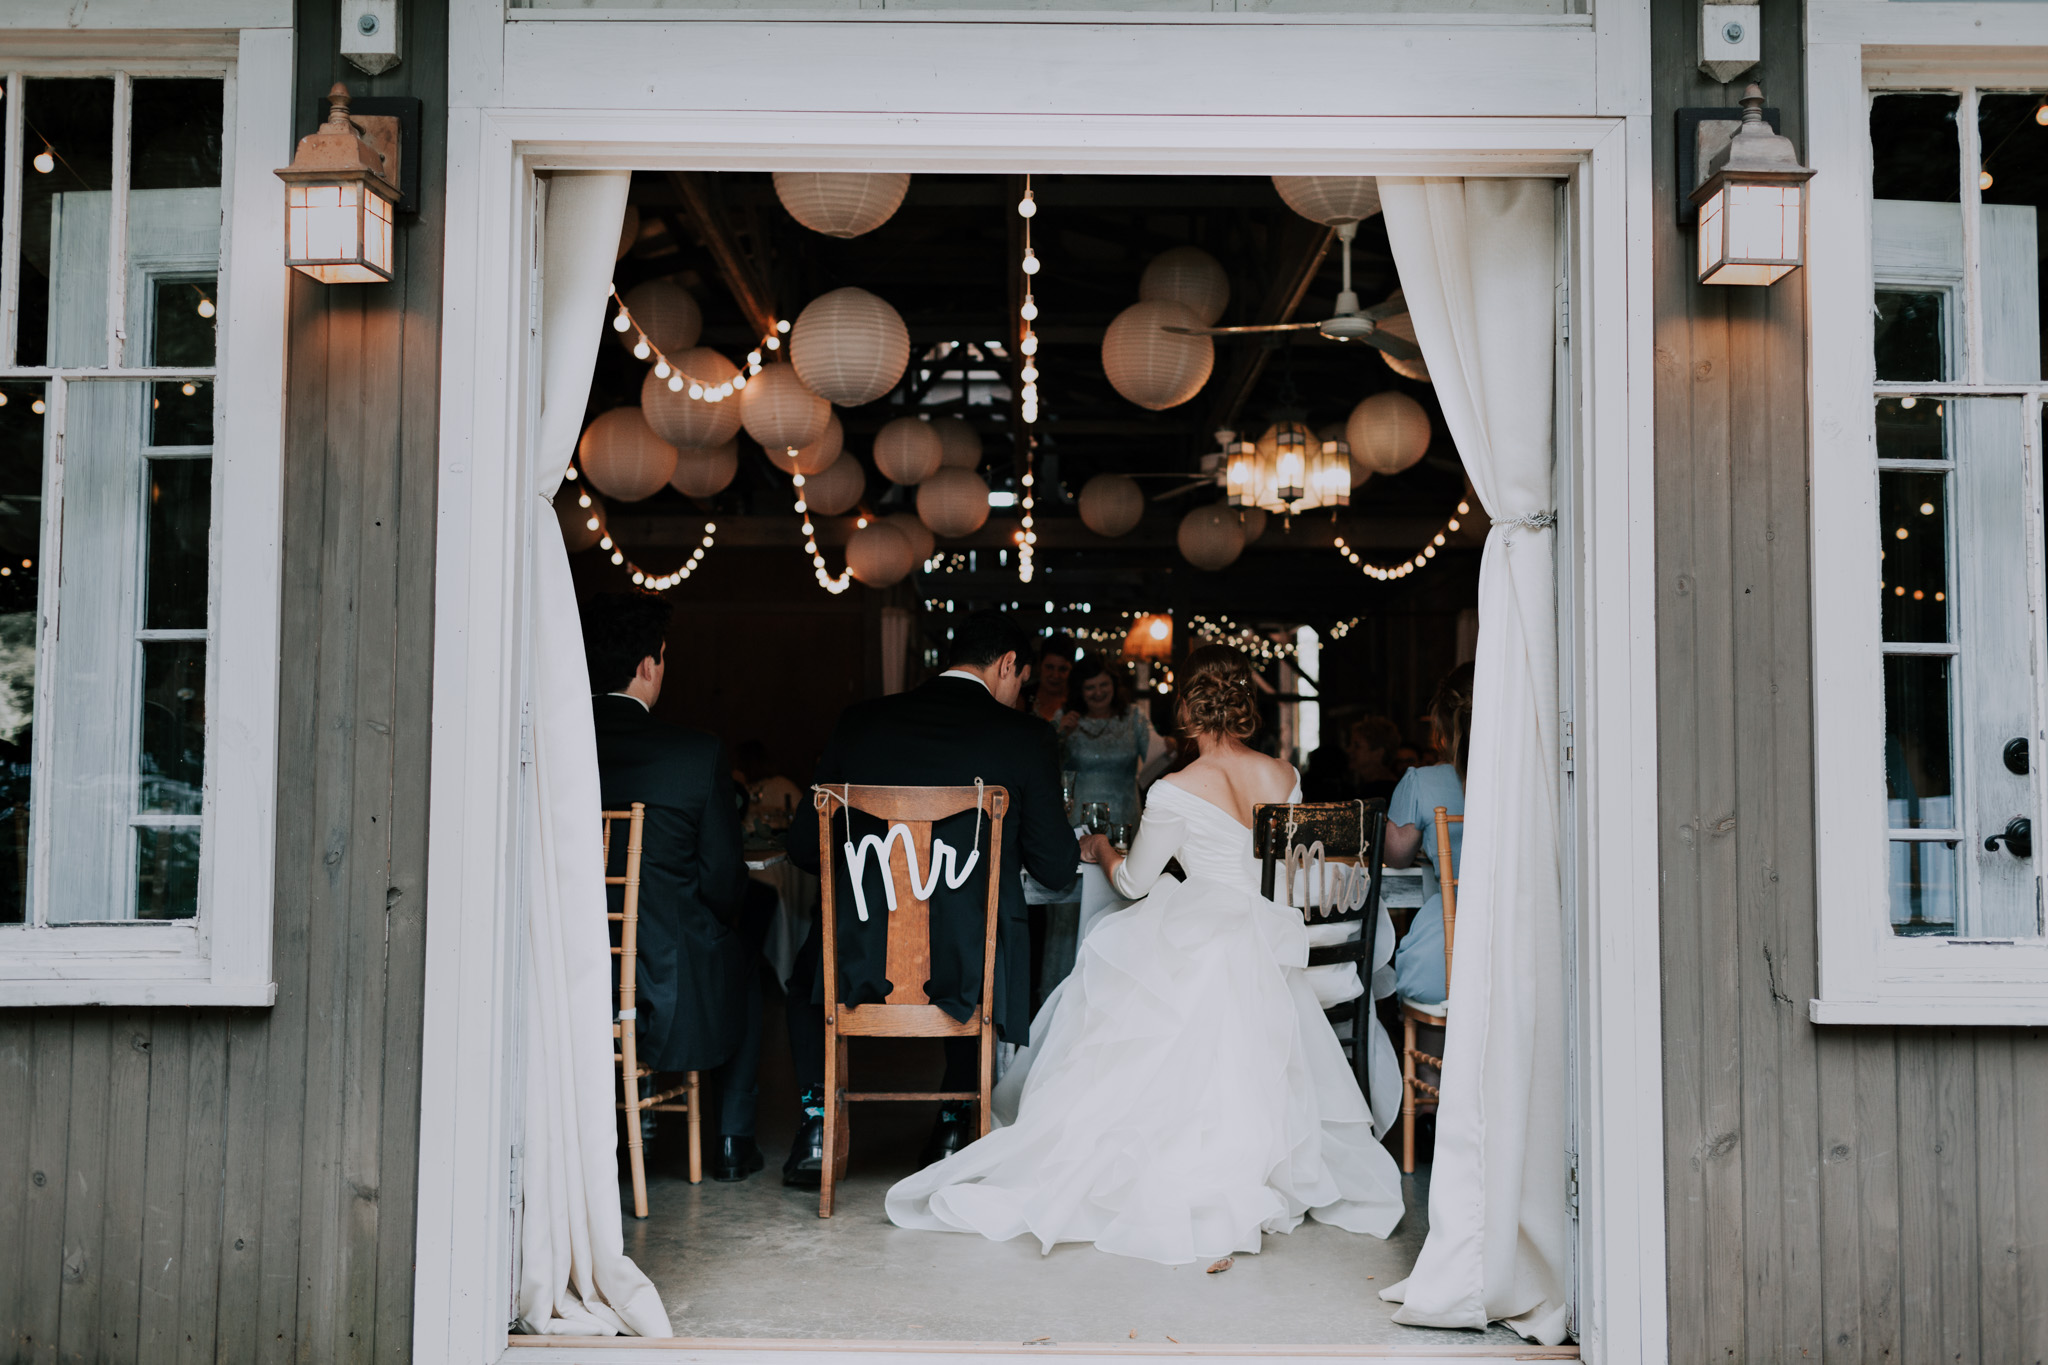 MillCreek-Wilde-Wedding-Barn-Michigan-Eliza-Eric-Vafa-Photo934.jpg